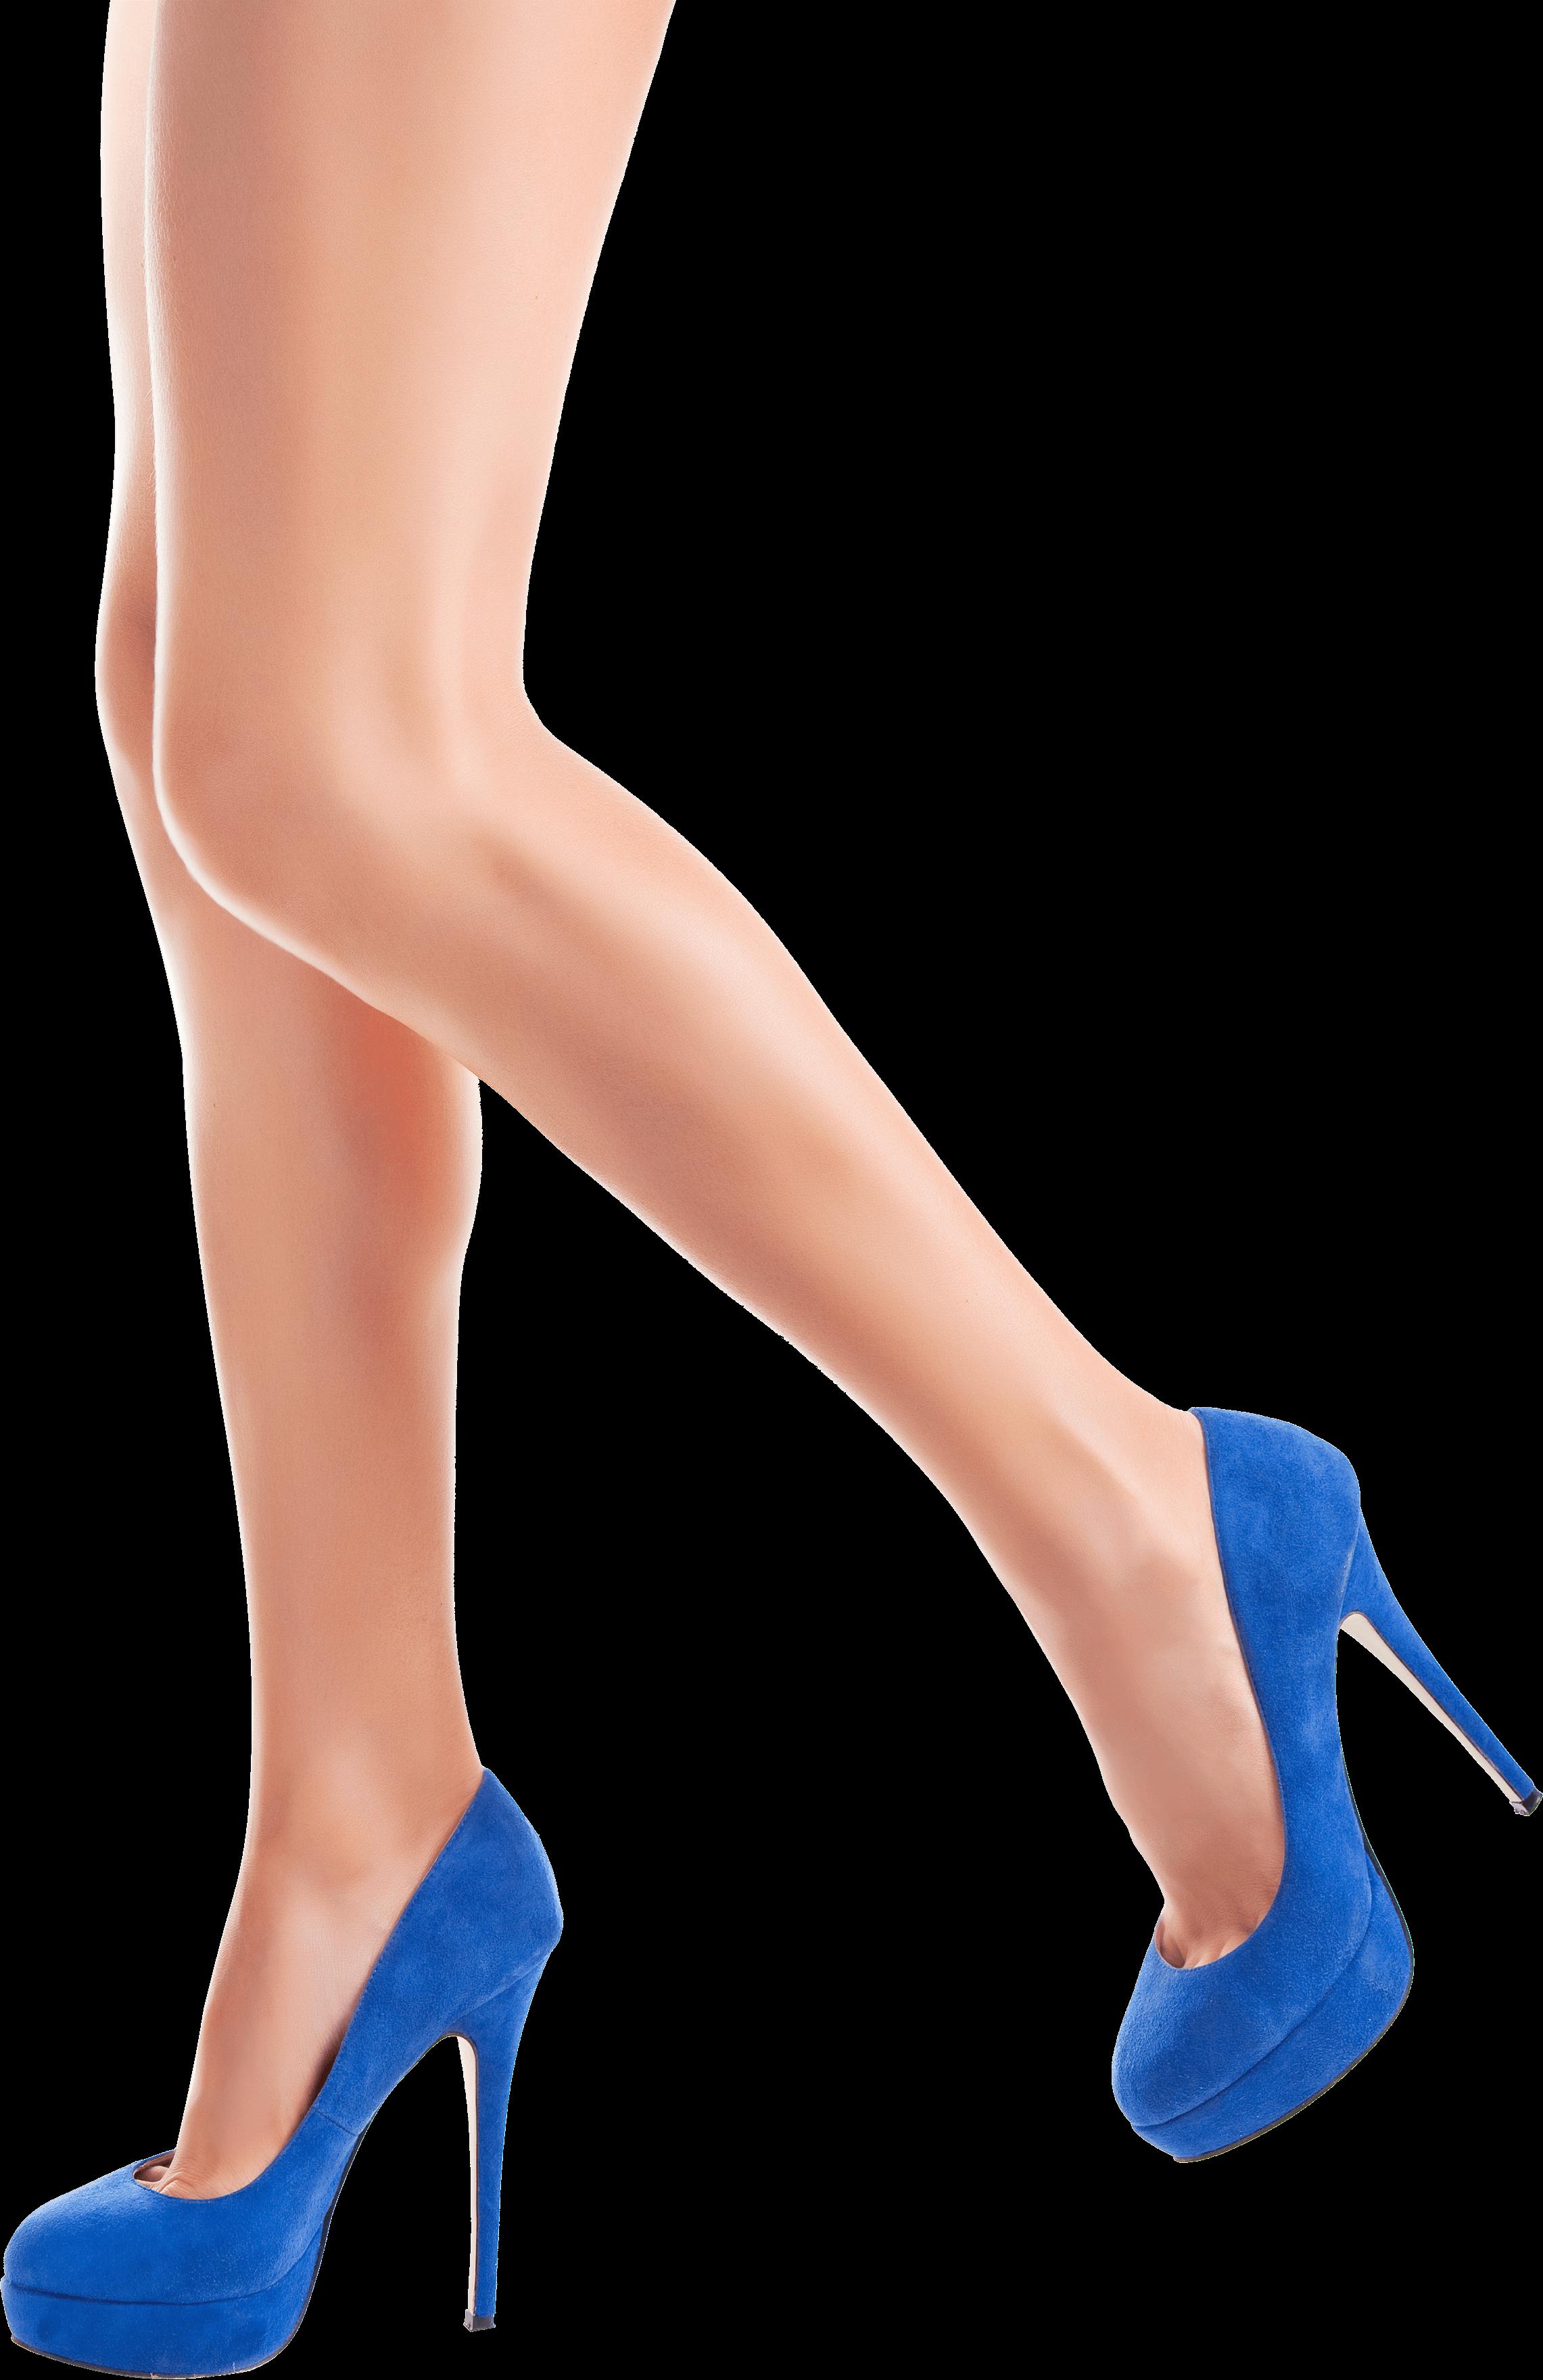 PNG File Name: Female Leg PlusPng.com  - Legs PNG